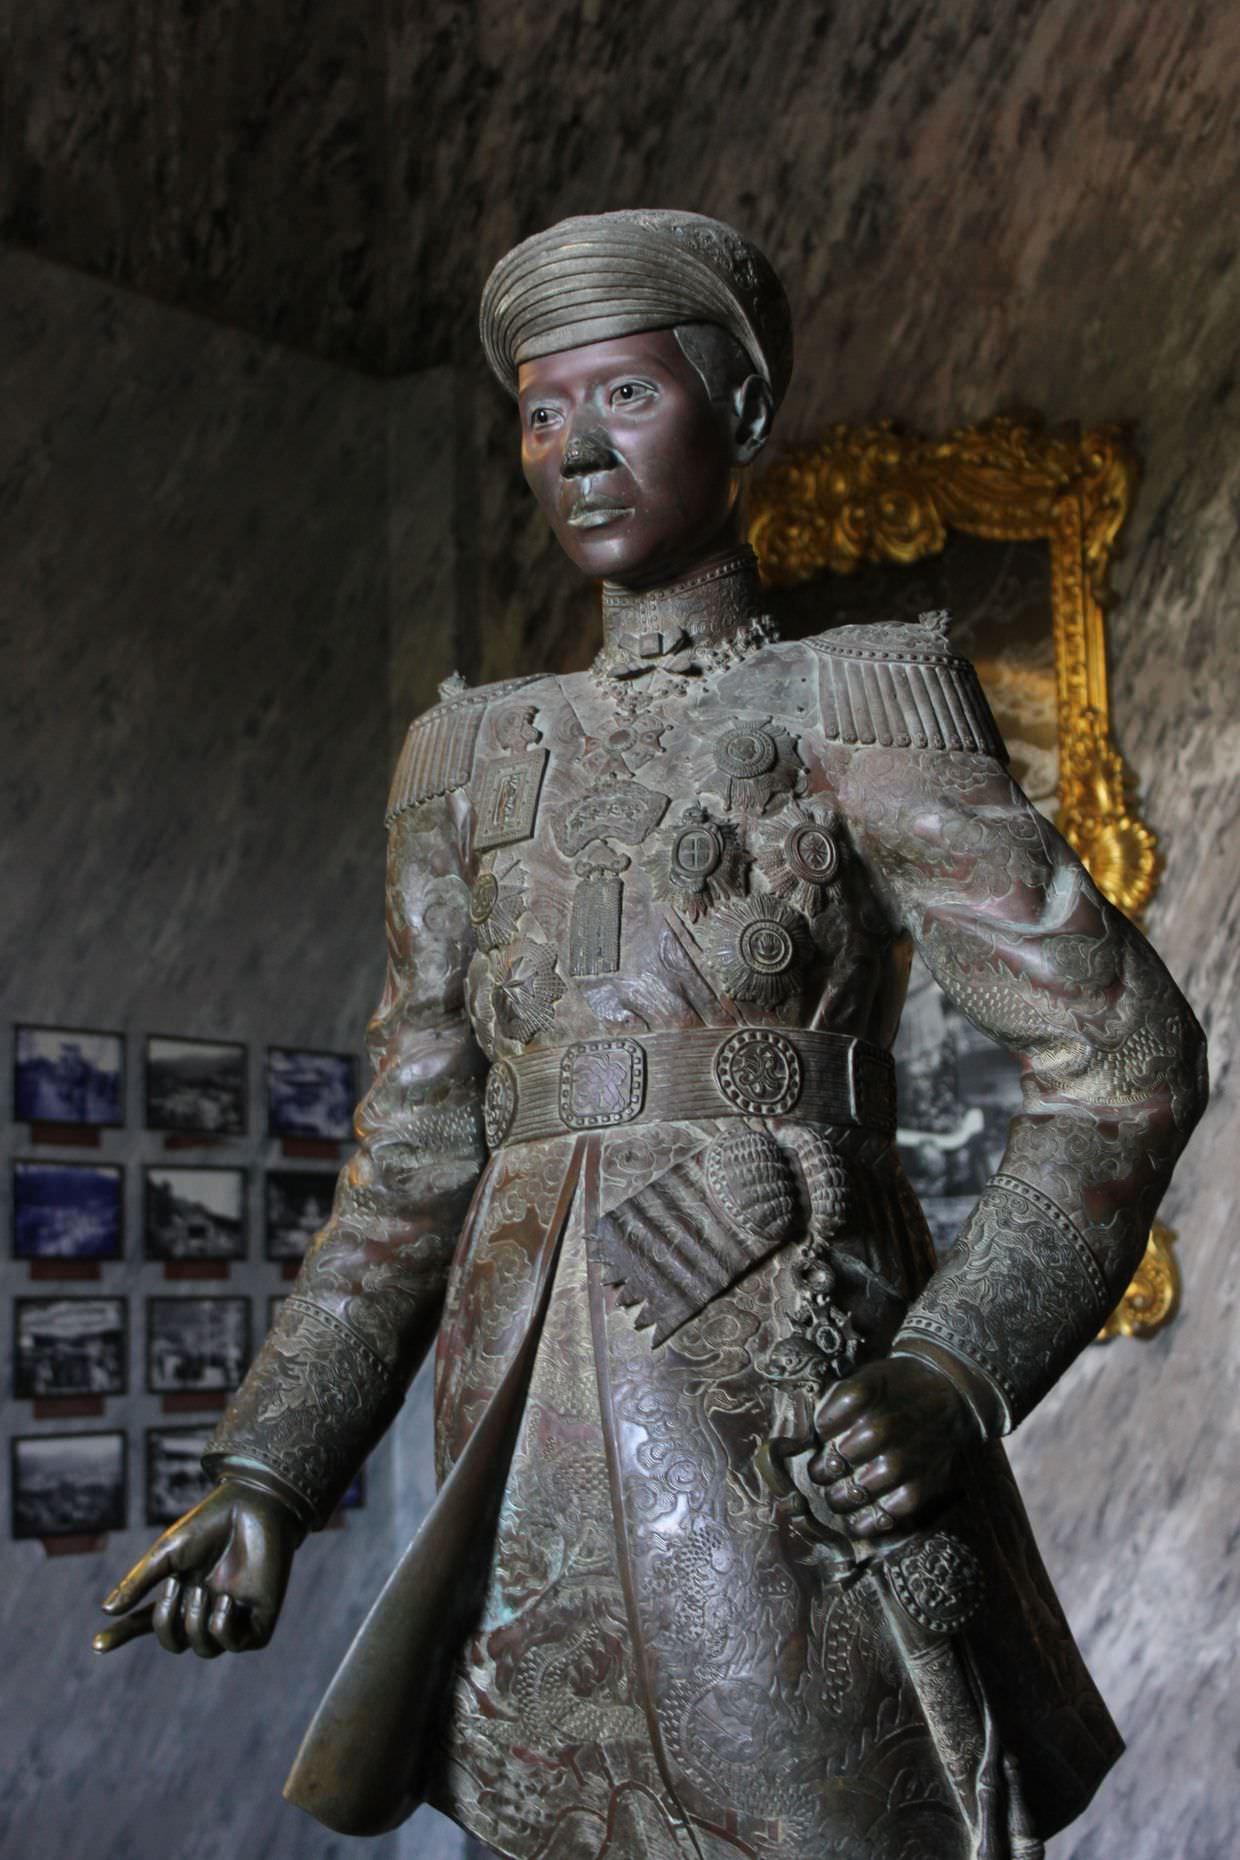 Emperor Khai Dinh's bronze statue